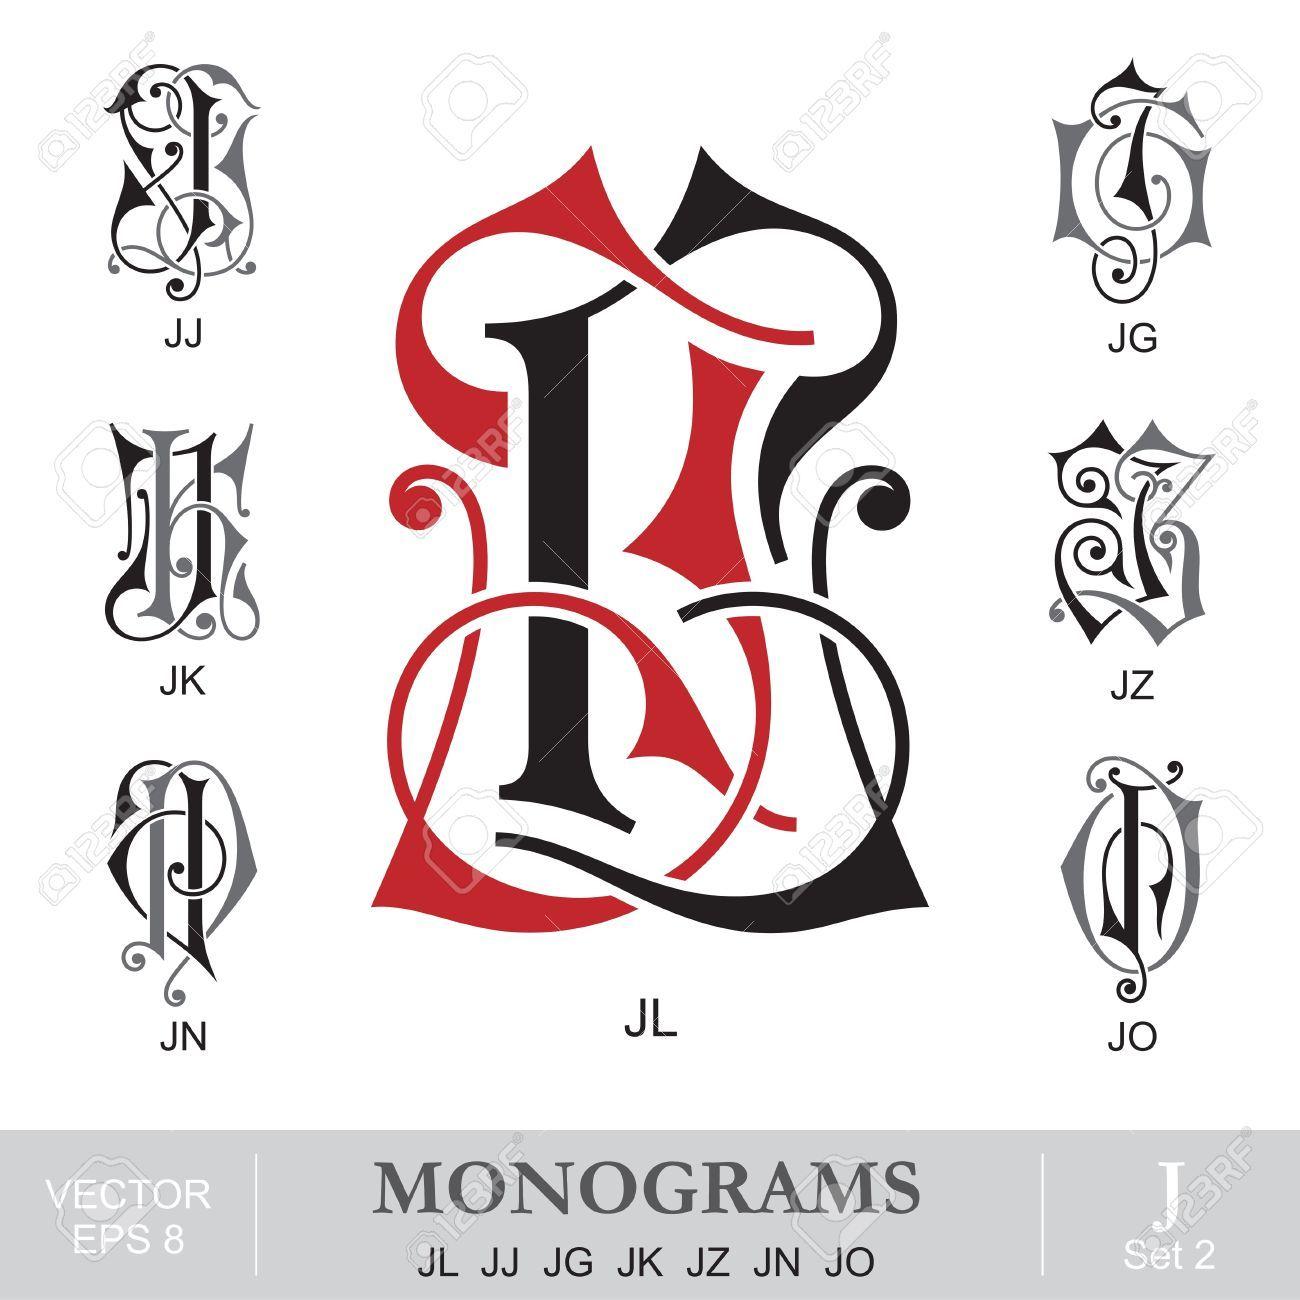 Tj initial luxury ornament monogram logo stock vector - Illustration Of Vintage Monograms Jl Jj Jg Jk Jz Jn Jo Vector Art Clipart And Stock Vectors